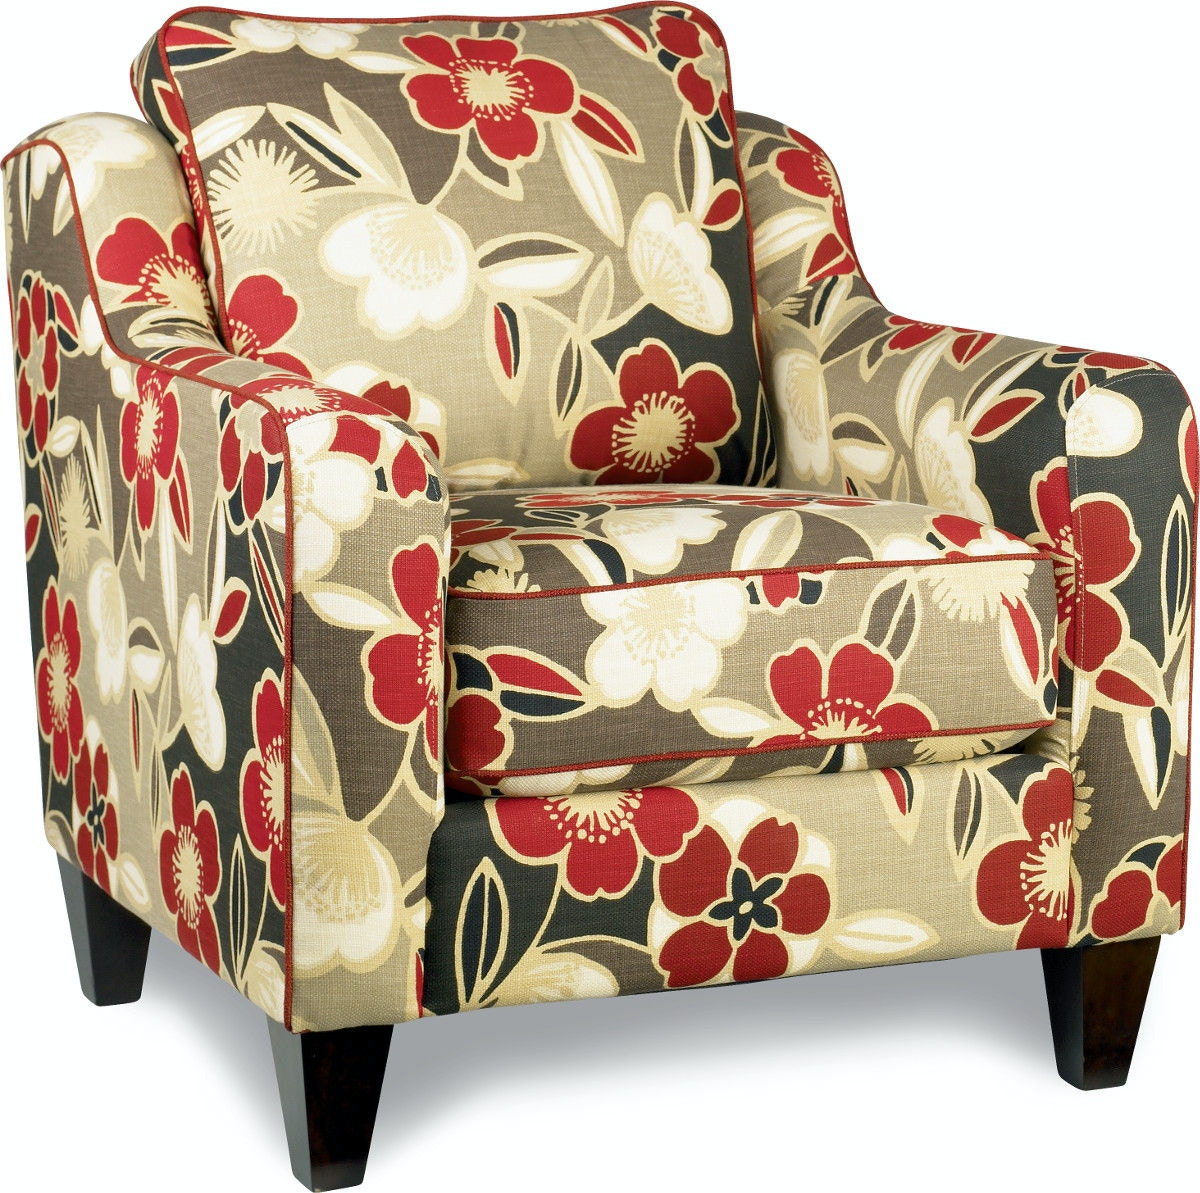 Living Room La Z Boy Premier Stationary Chair 230451 Jensen Home